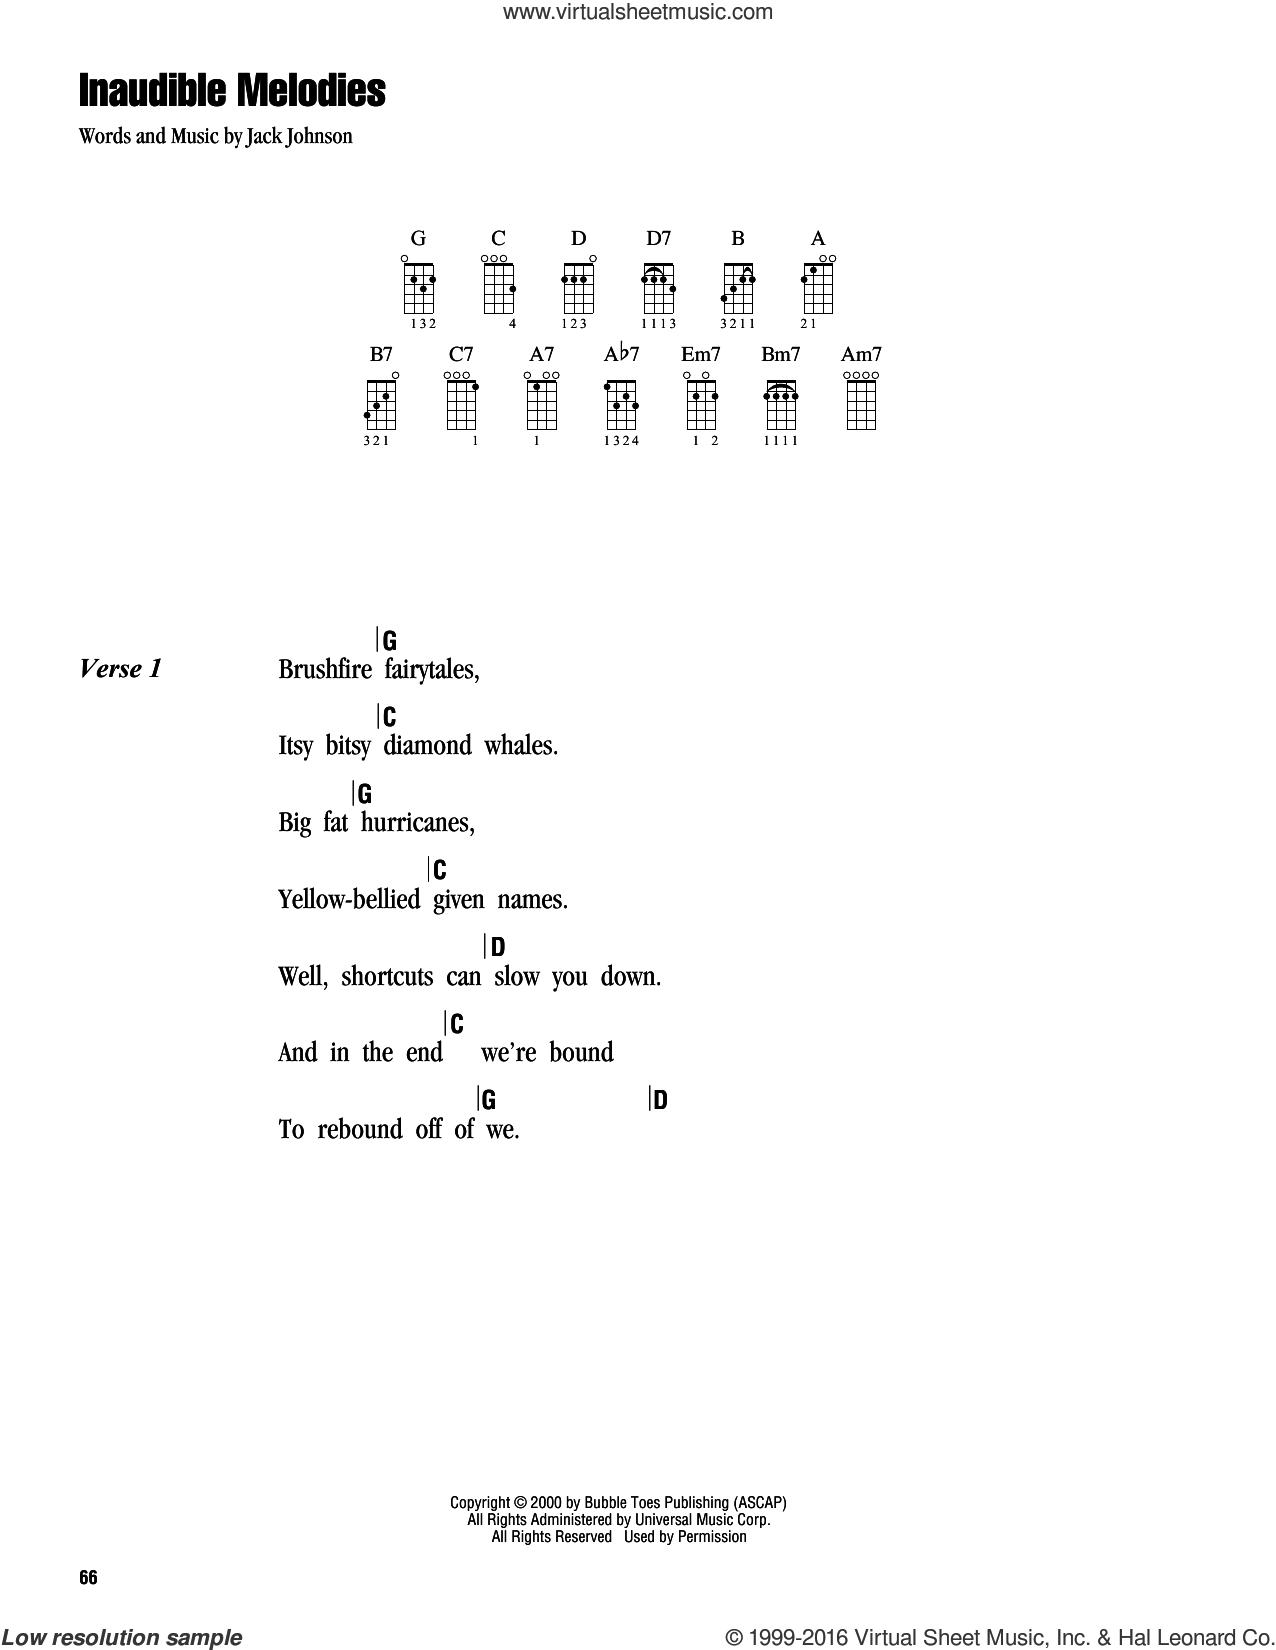 Inaudible Melodies sheet music for ukulele (chords) by Jack Johnson, intermediate skill level